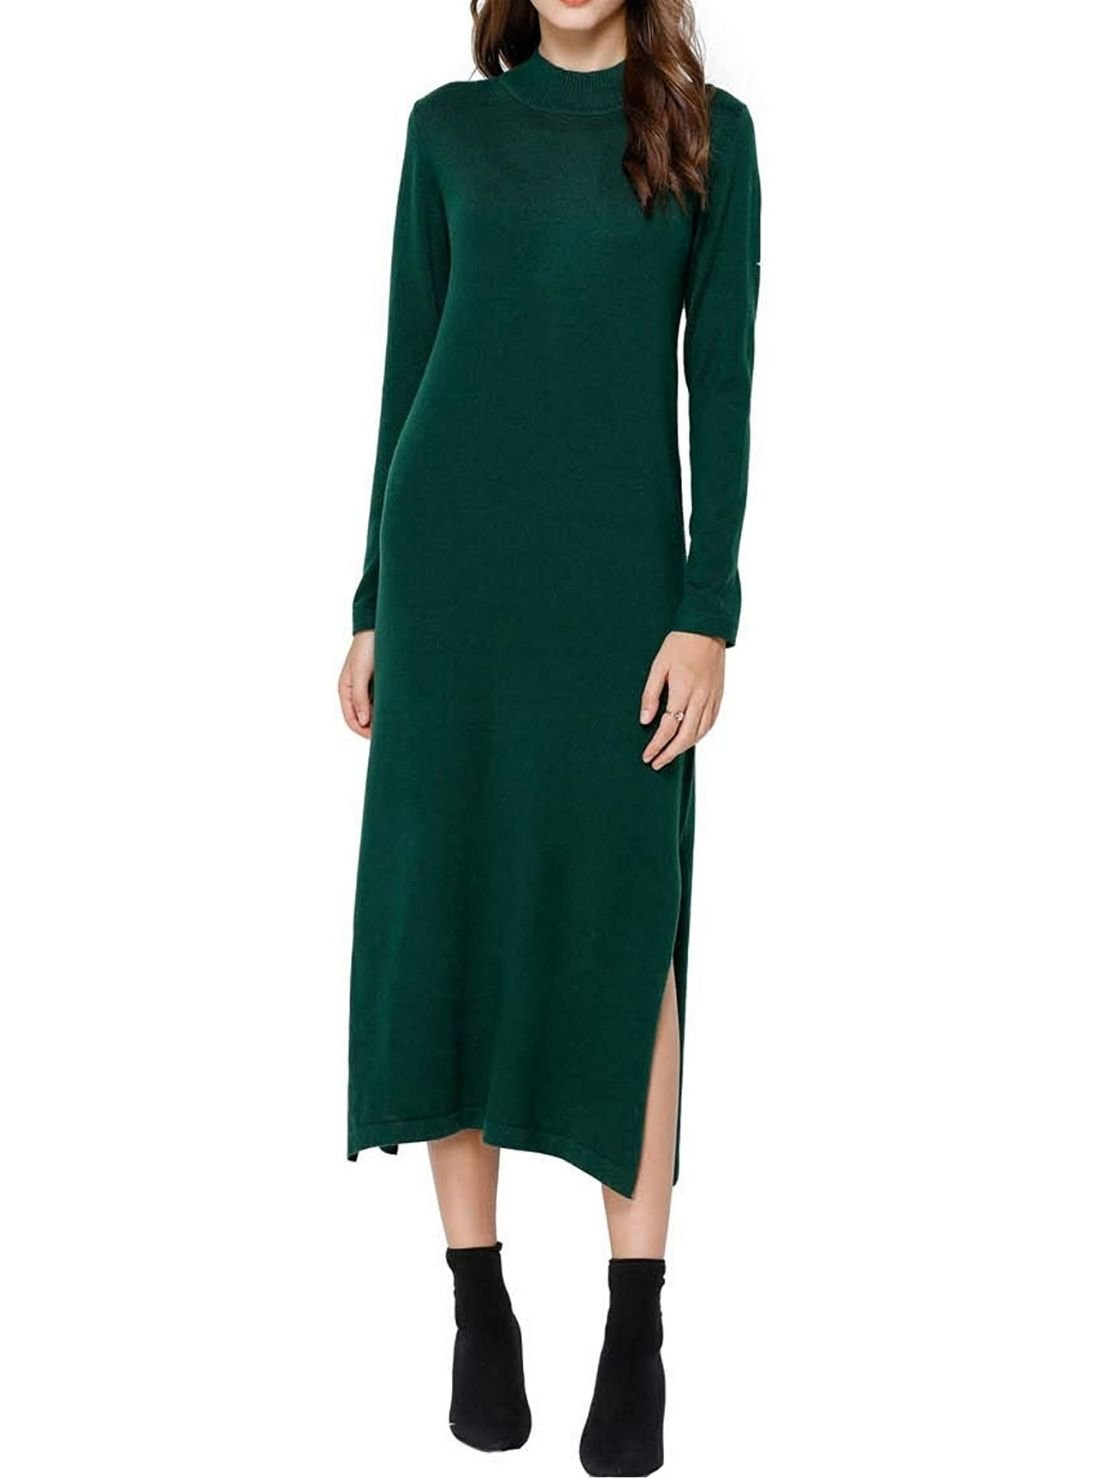 Wholesale Plain Sweater Dresses